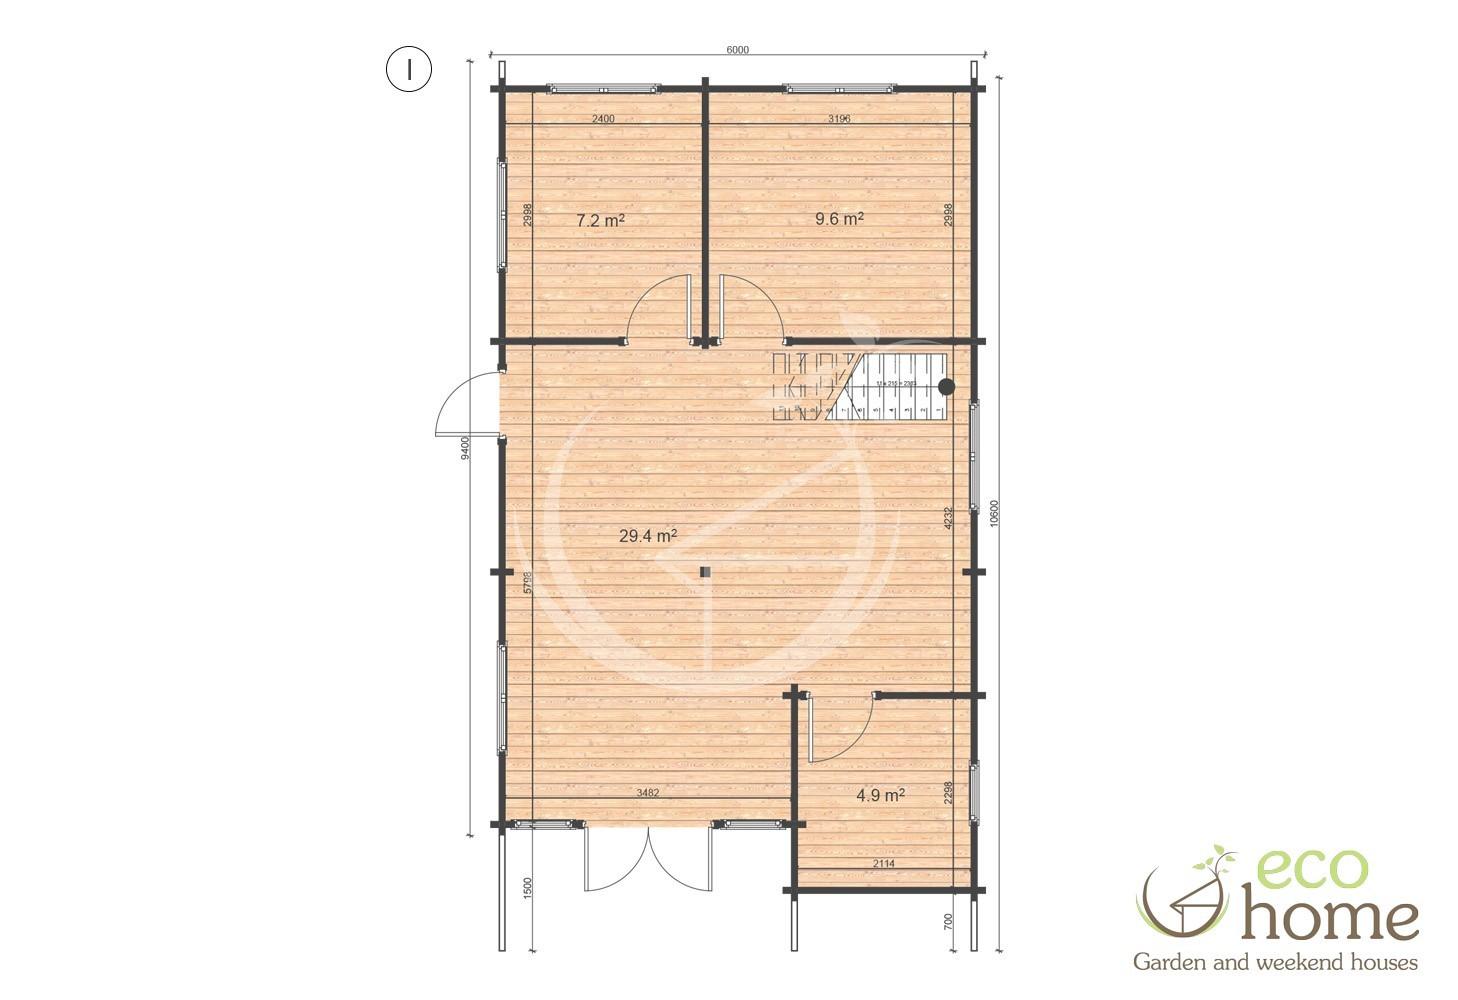 Two storey four bed log cabin felix 6m x 10m log cabins for Two storey log cabins for sale